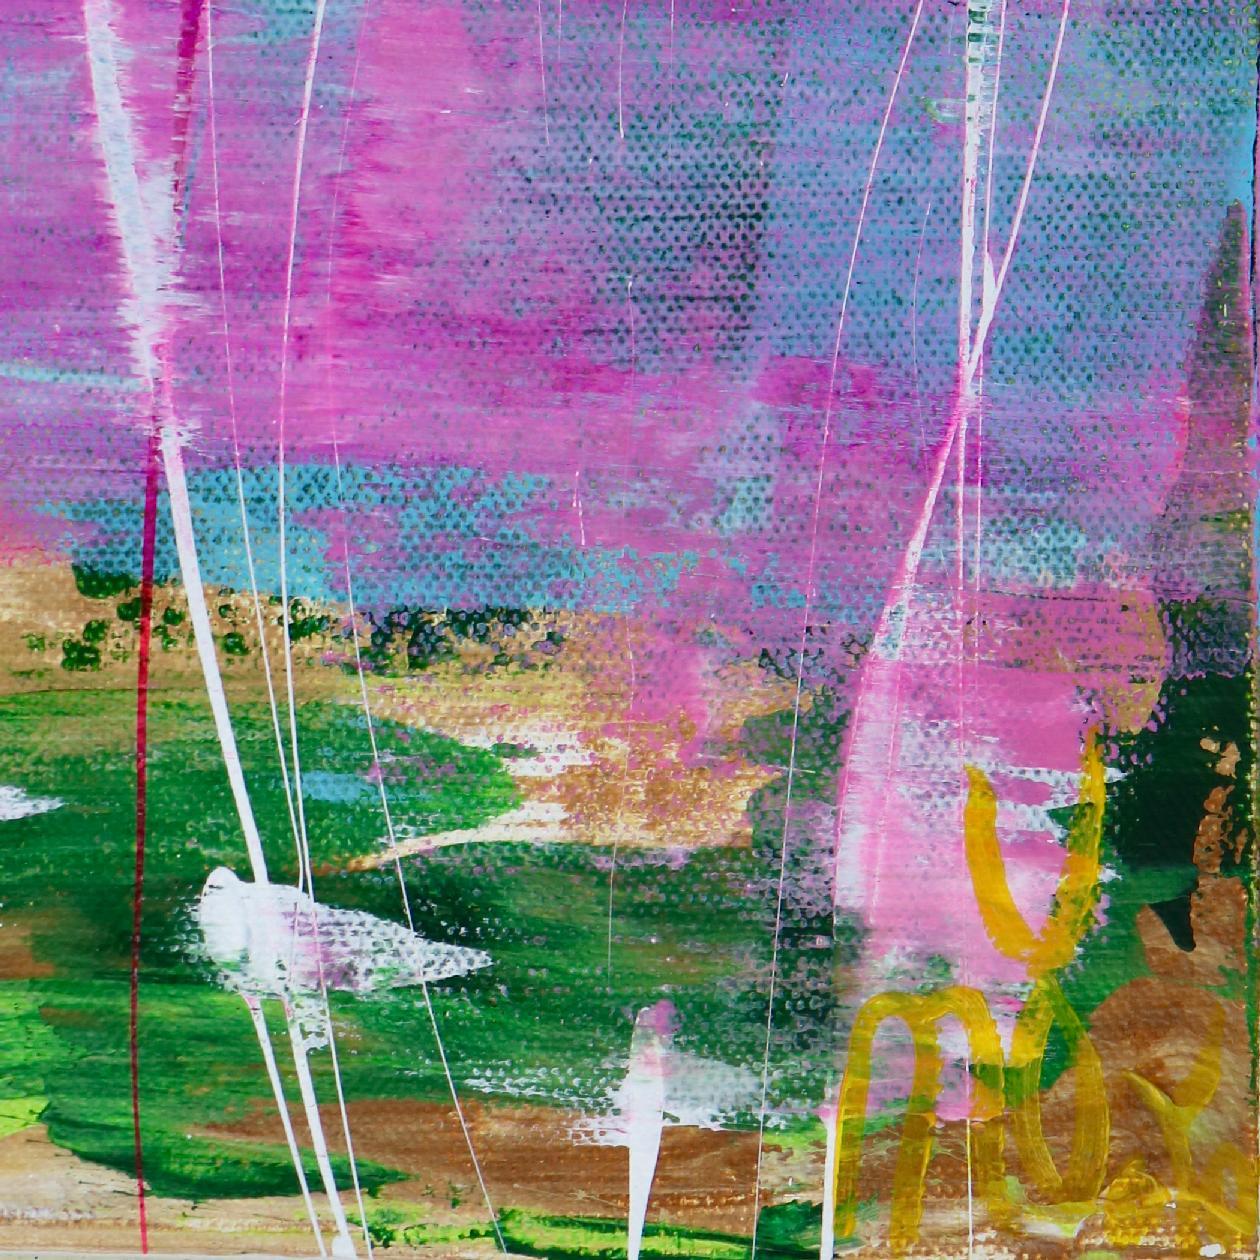 Signature - A Closer Look (Avant Garden) 1 (2020) by Nestor Toro